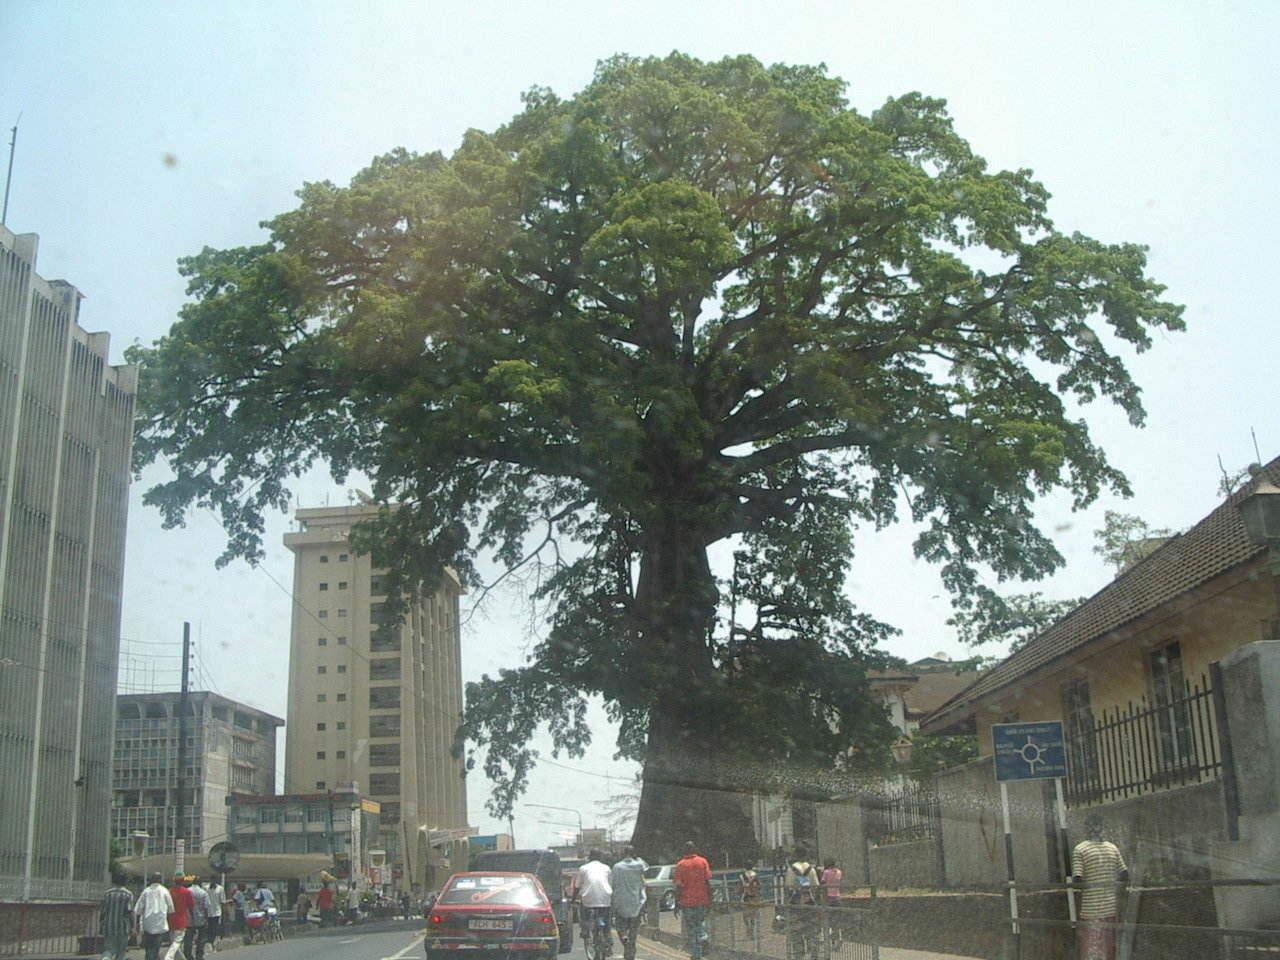 Cotton Tree, Freetown, Sierra Leone